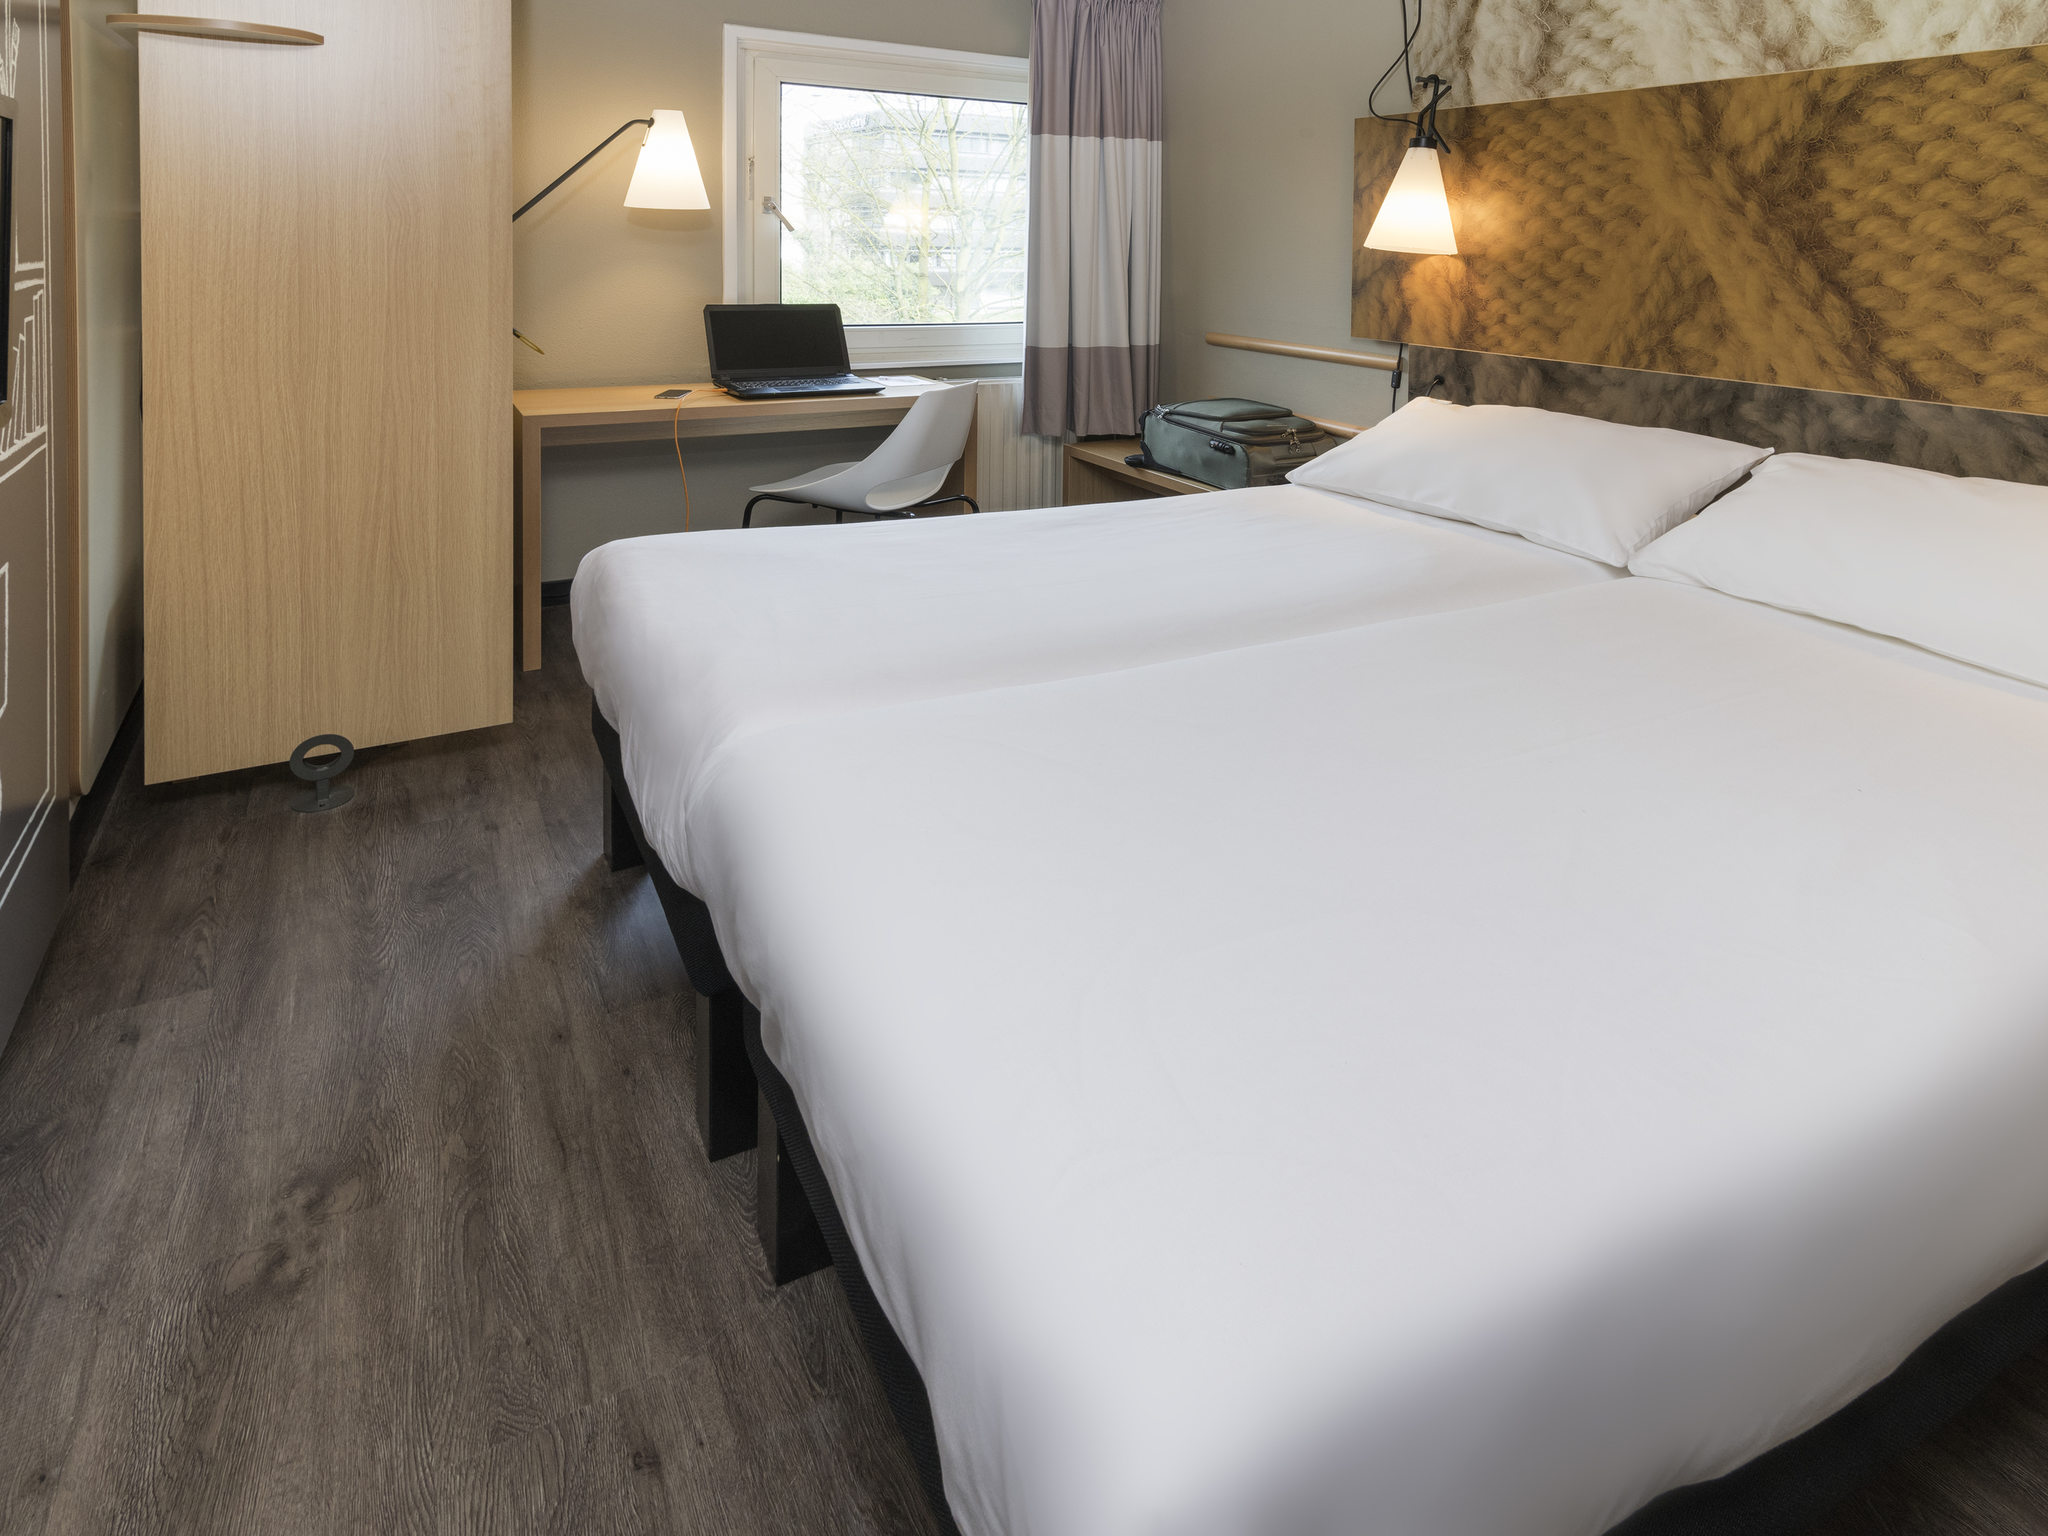 Goedkope Badkamer Tilburg : Goedkoop hotel tilburg ibis vlakbij efteling